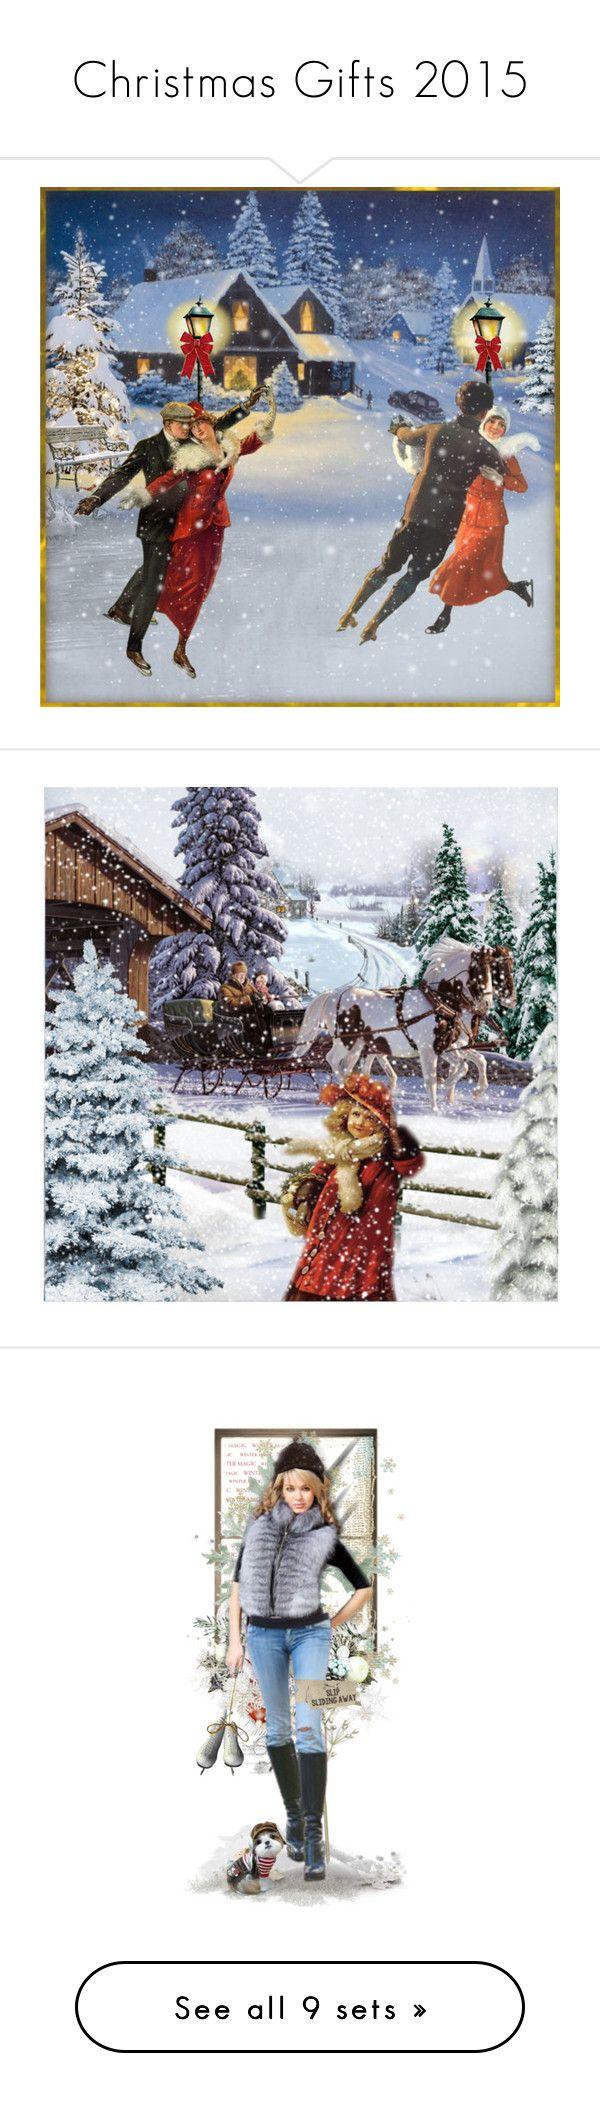 """Christmas Gifts 2015"" by lastchance ❤ liked on Polyvore featuring art, artset, dolset, Karen Millen, Dee Keller, Ashley Pittman, Henri Bendel, Christmas, santa and polyvoreeditorial"